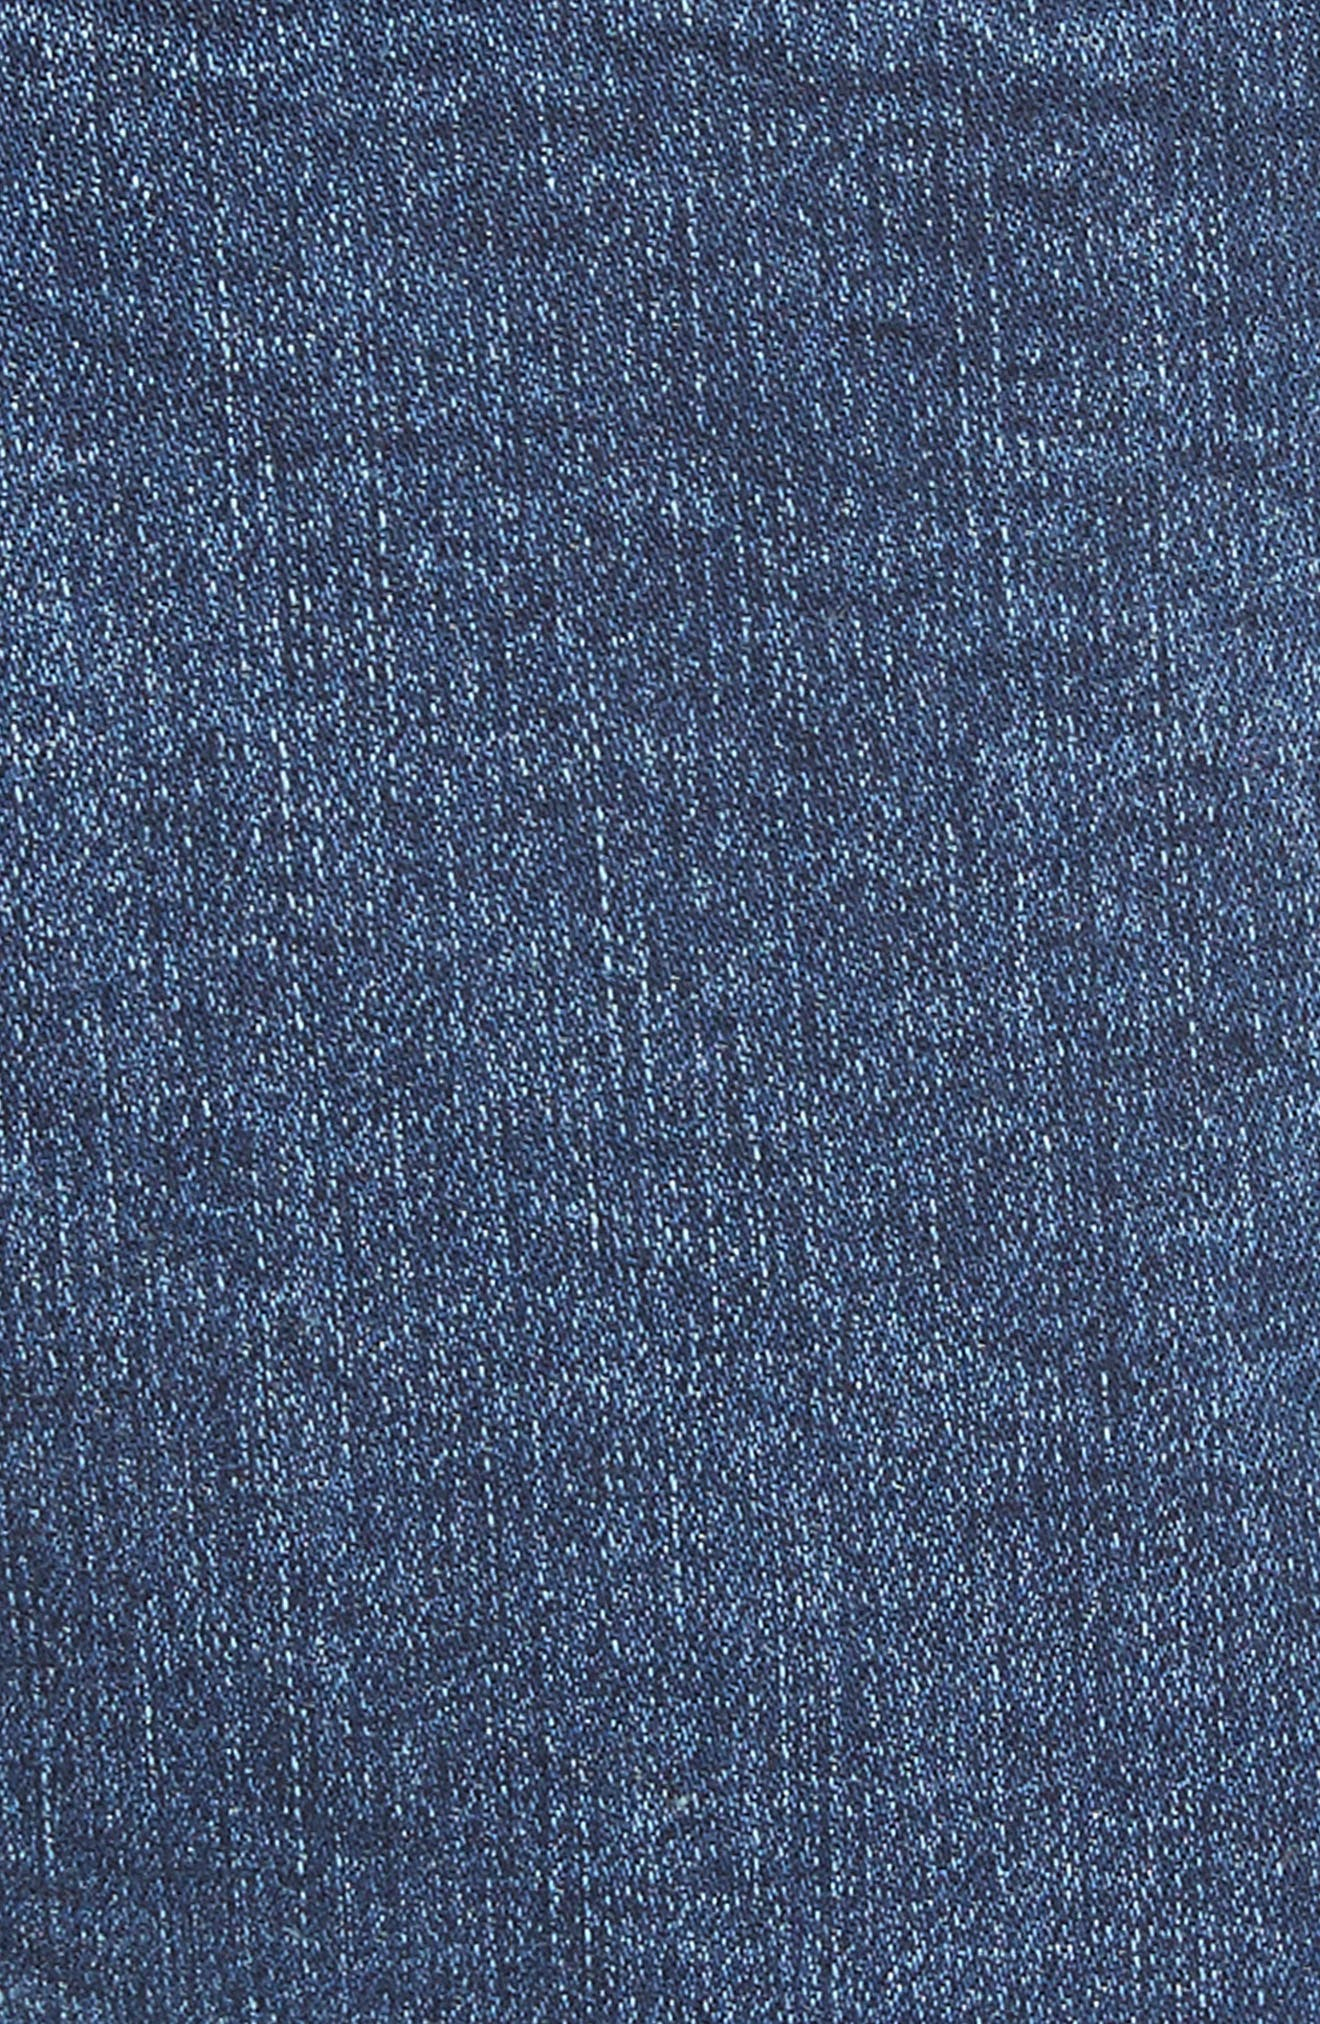 Lace-Up High Waist Denim Leggings,                             Alternate thumbnail 5, color,                             Blue